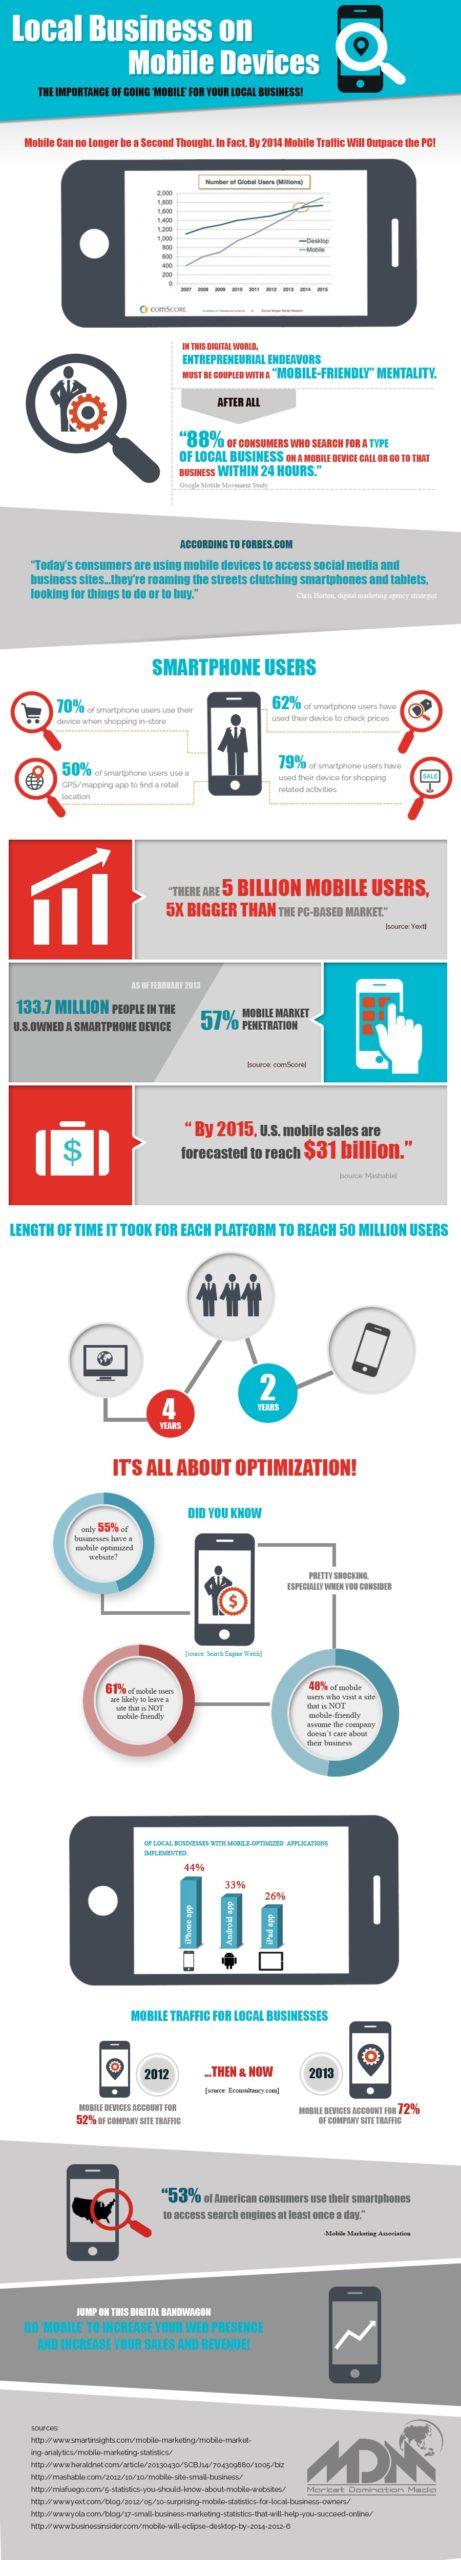 infographie-importance-visibilite-mobile